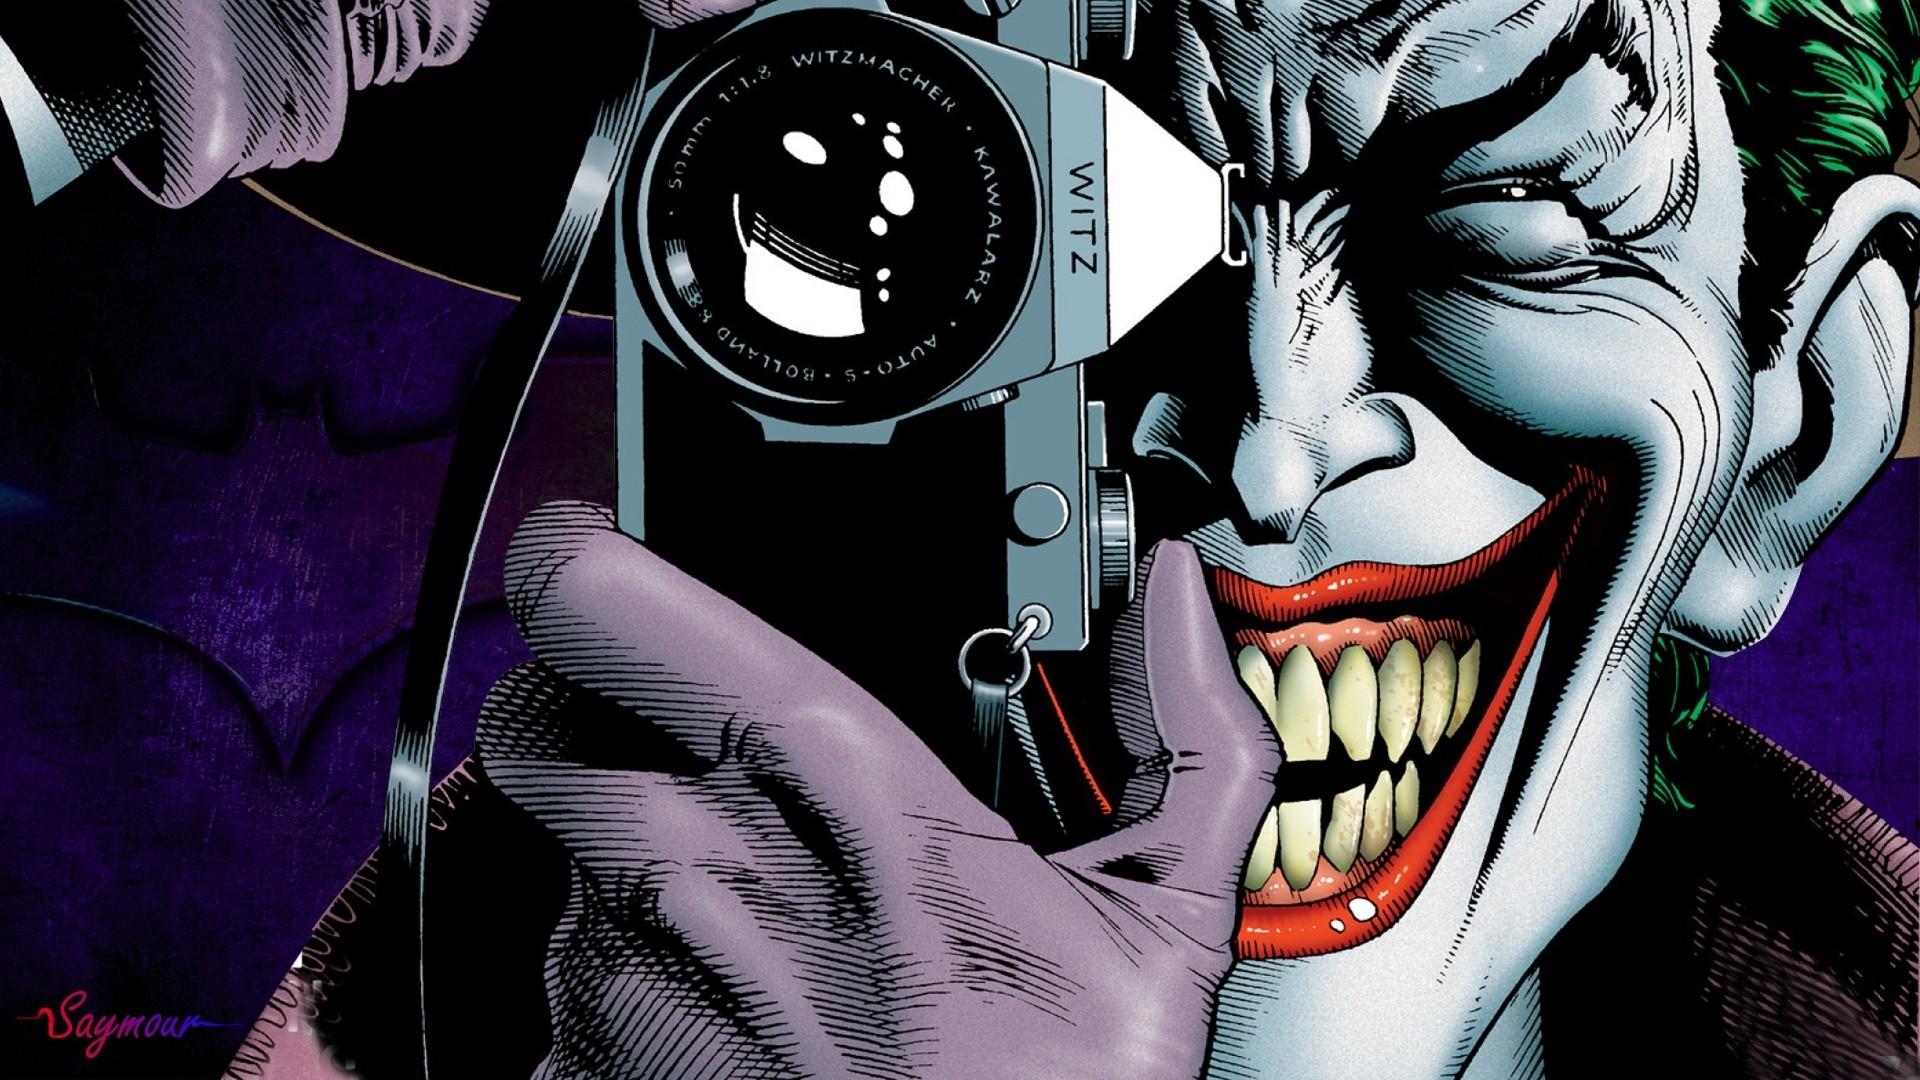 joker [1920×1080] Need #iPhone #6S #Plus #Wallpaper/ #Background